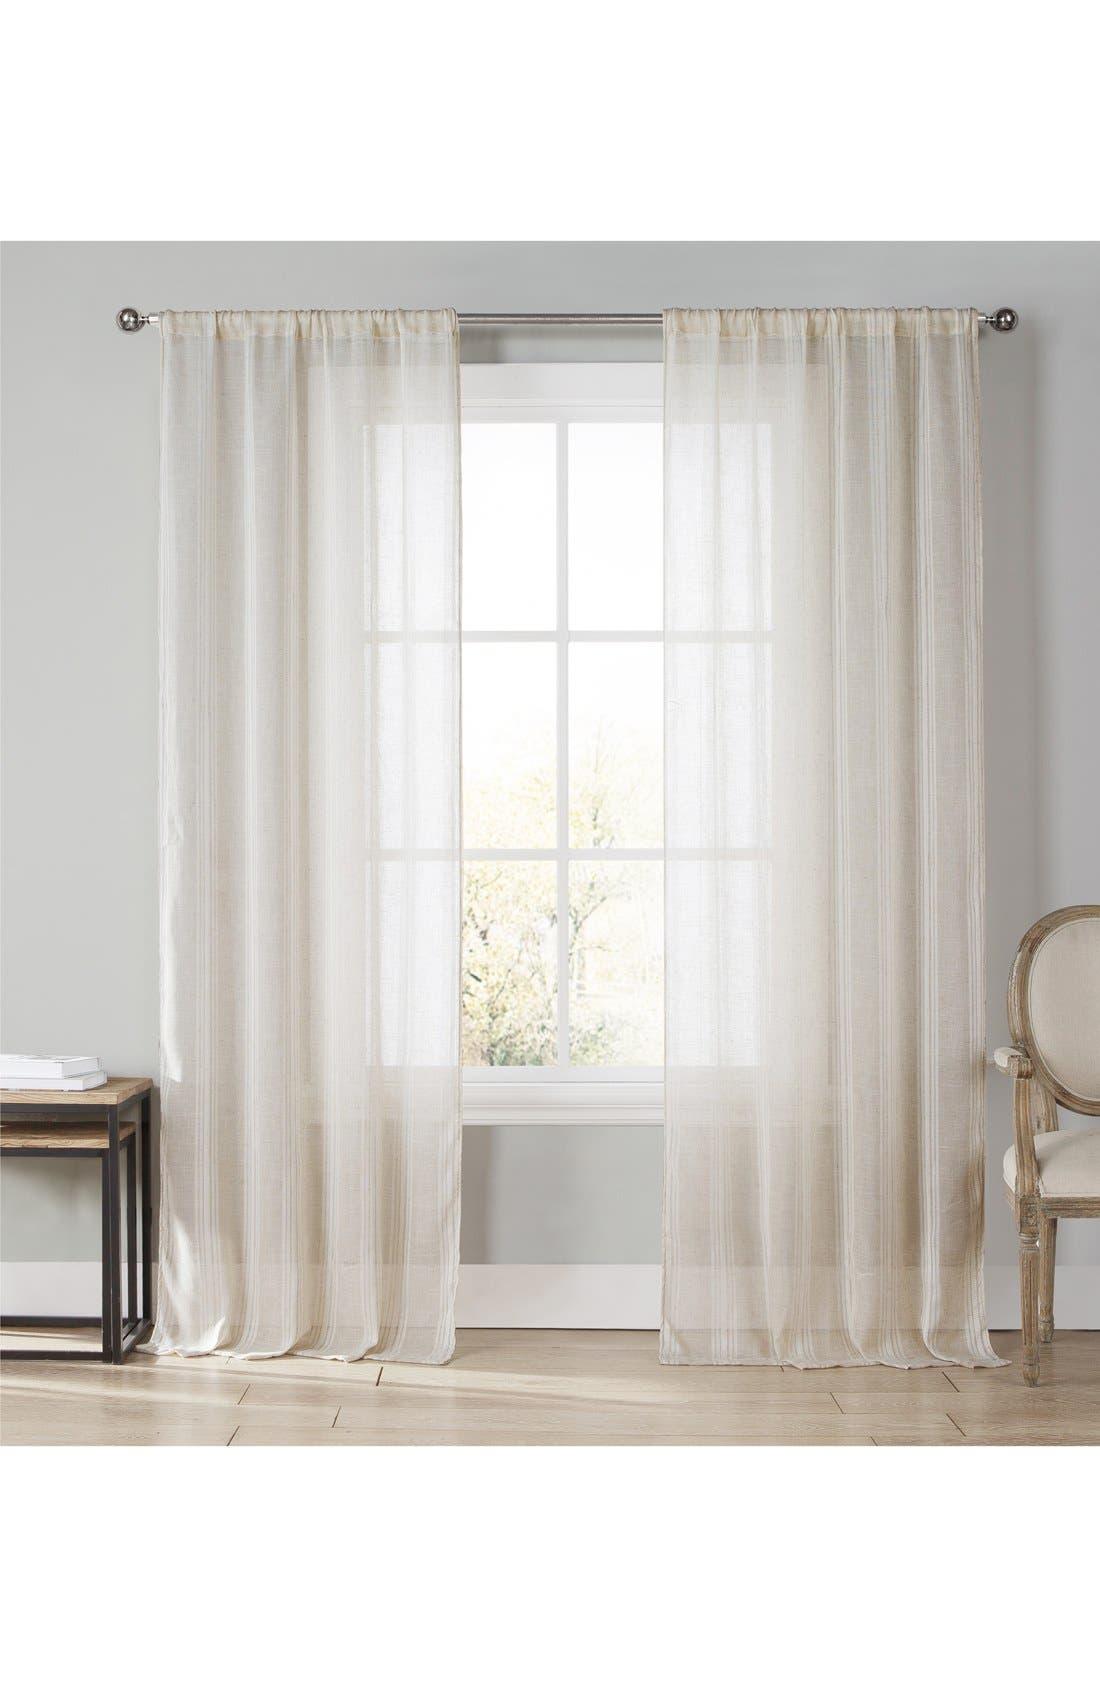 Main Image - Duck River Textile 'Xeni' Pole Top Window Panels (Set of 2)